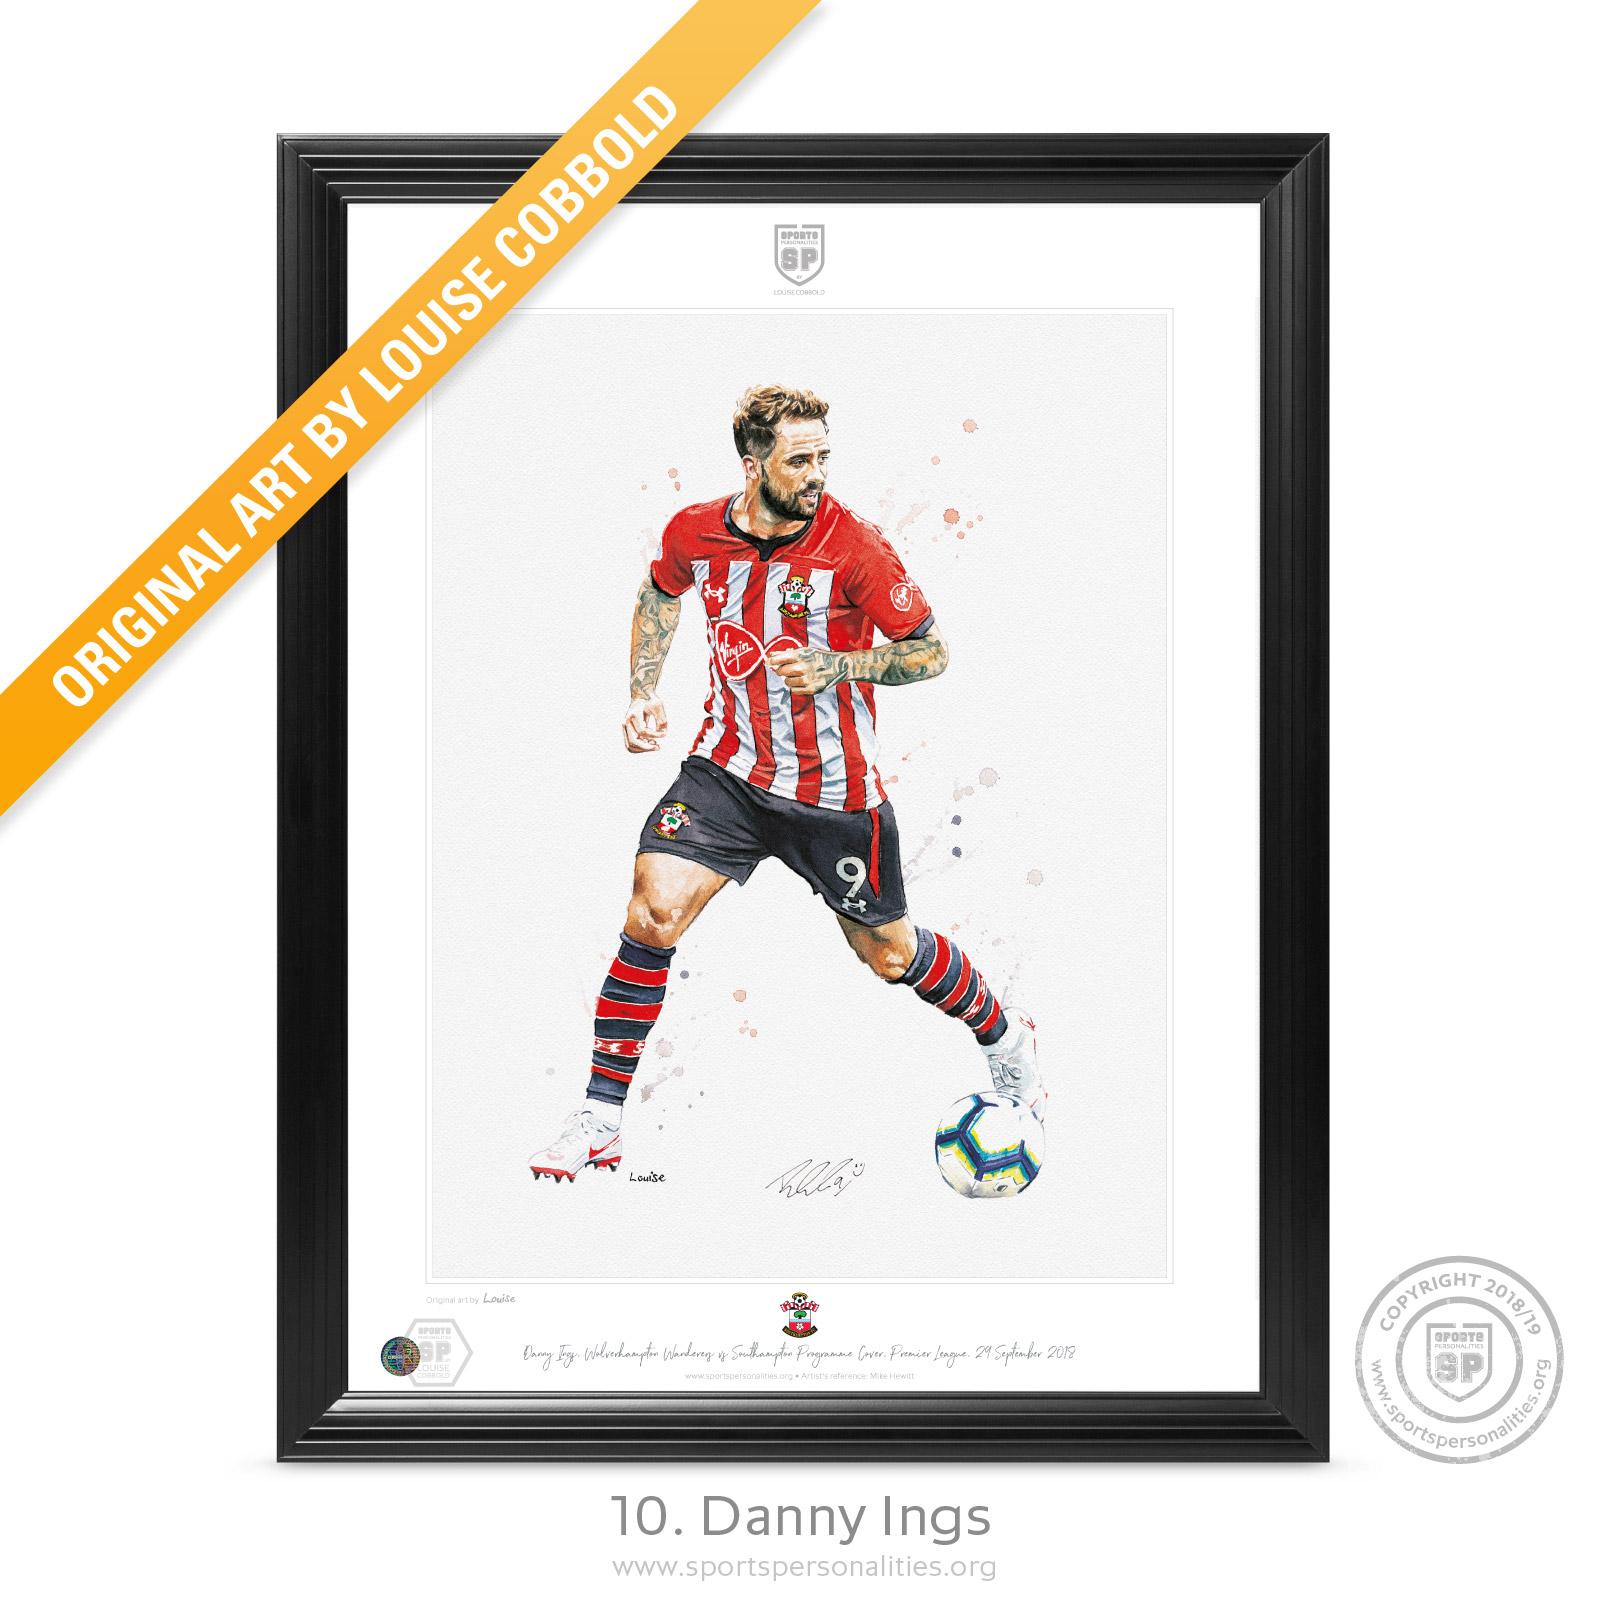 2018_19-SP_Auction_10._Danny_Ings.jpg